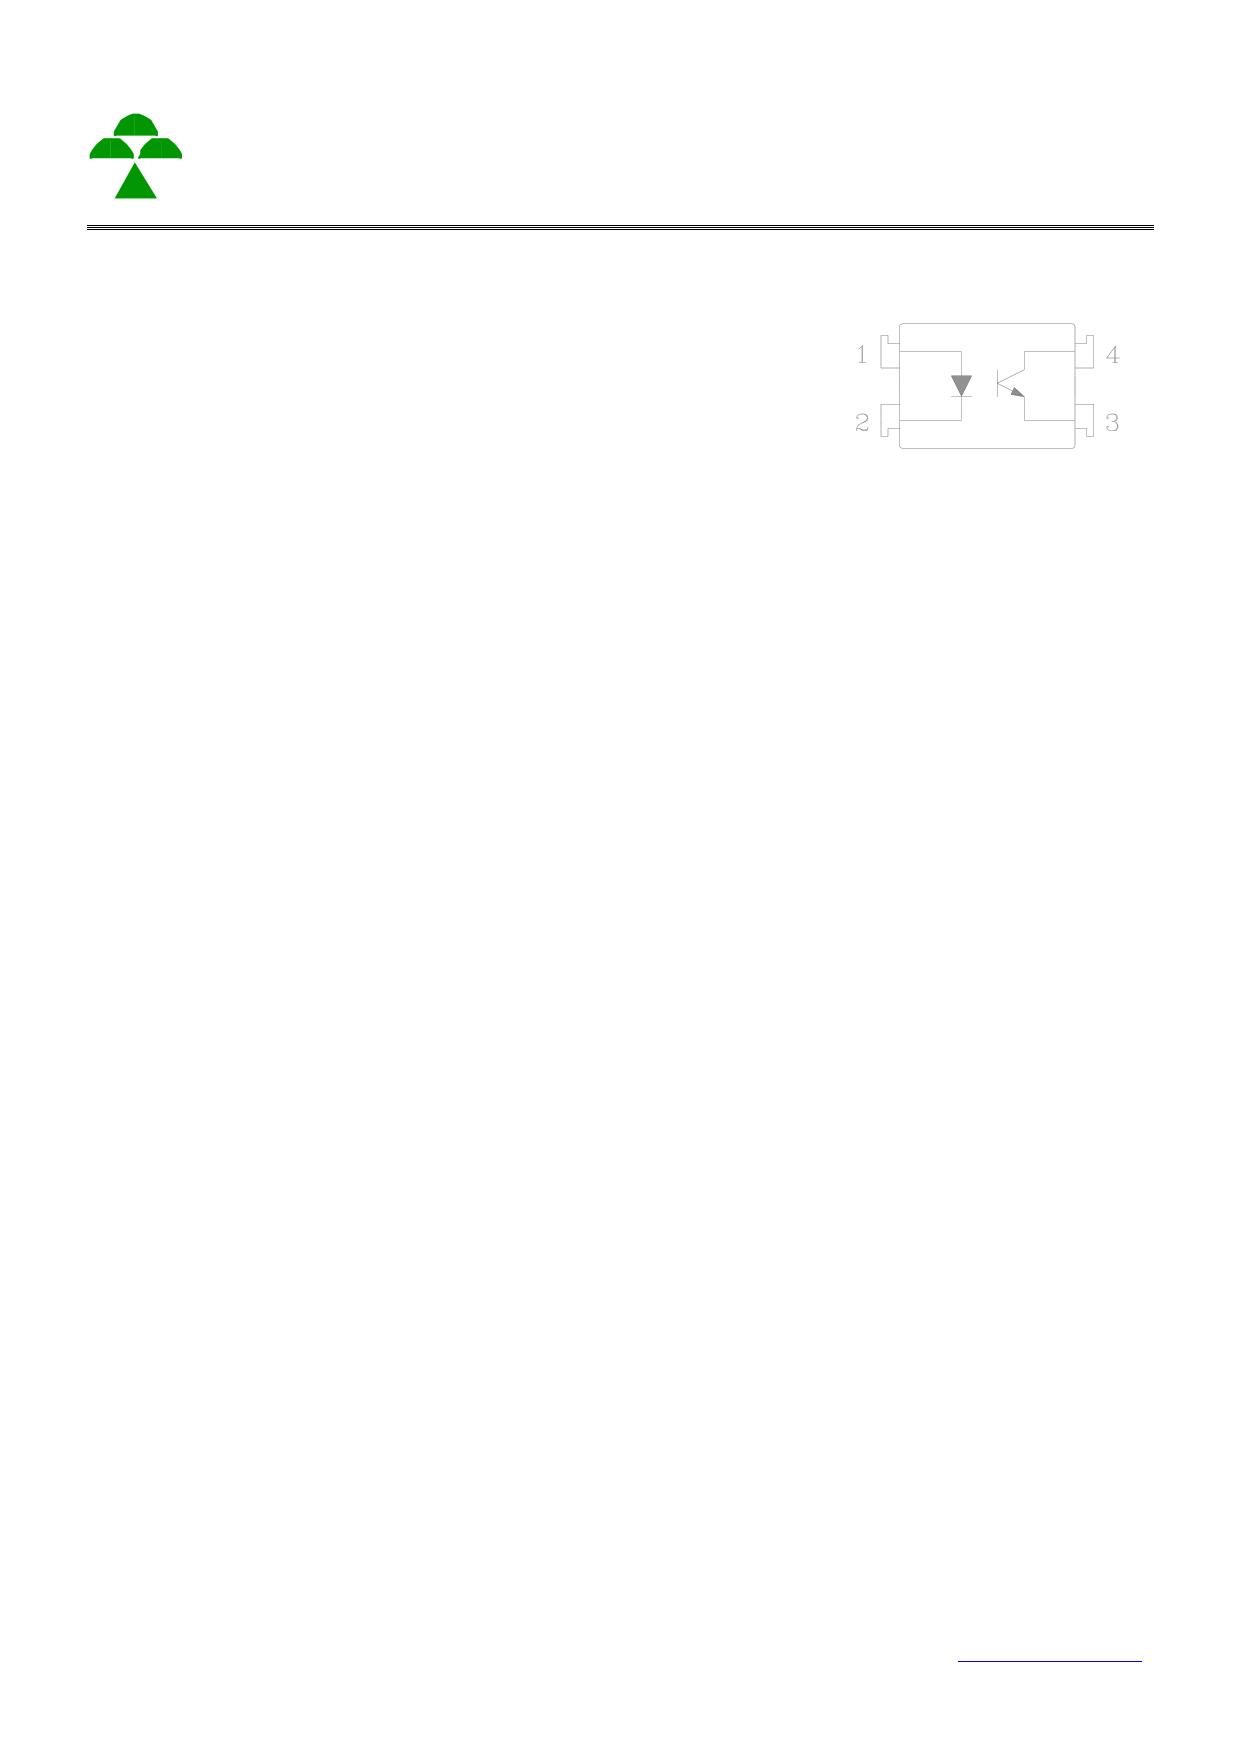 K10106W datasheet